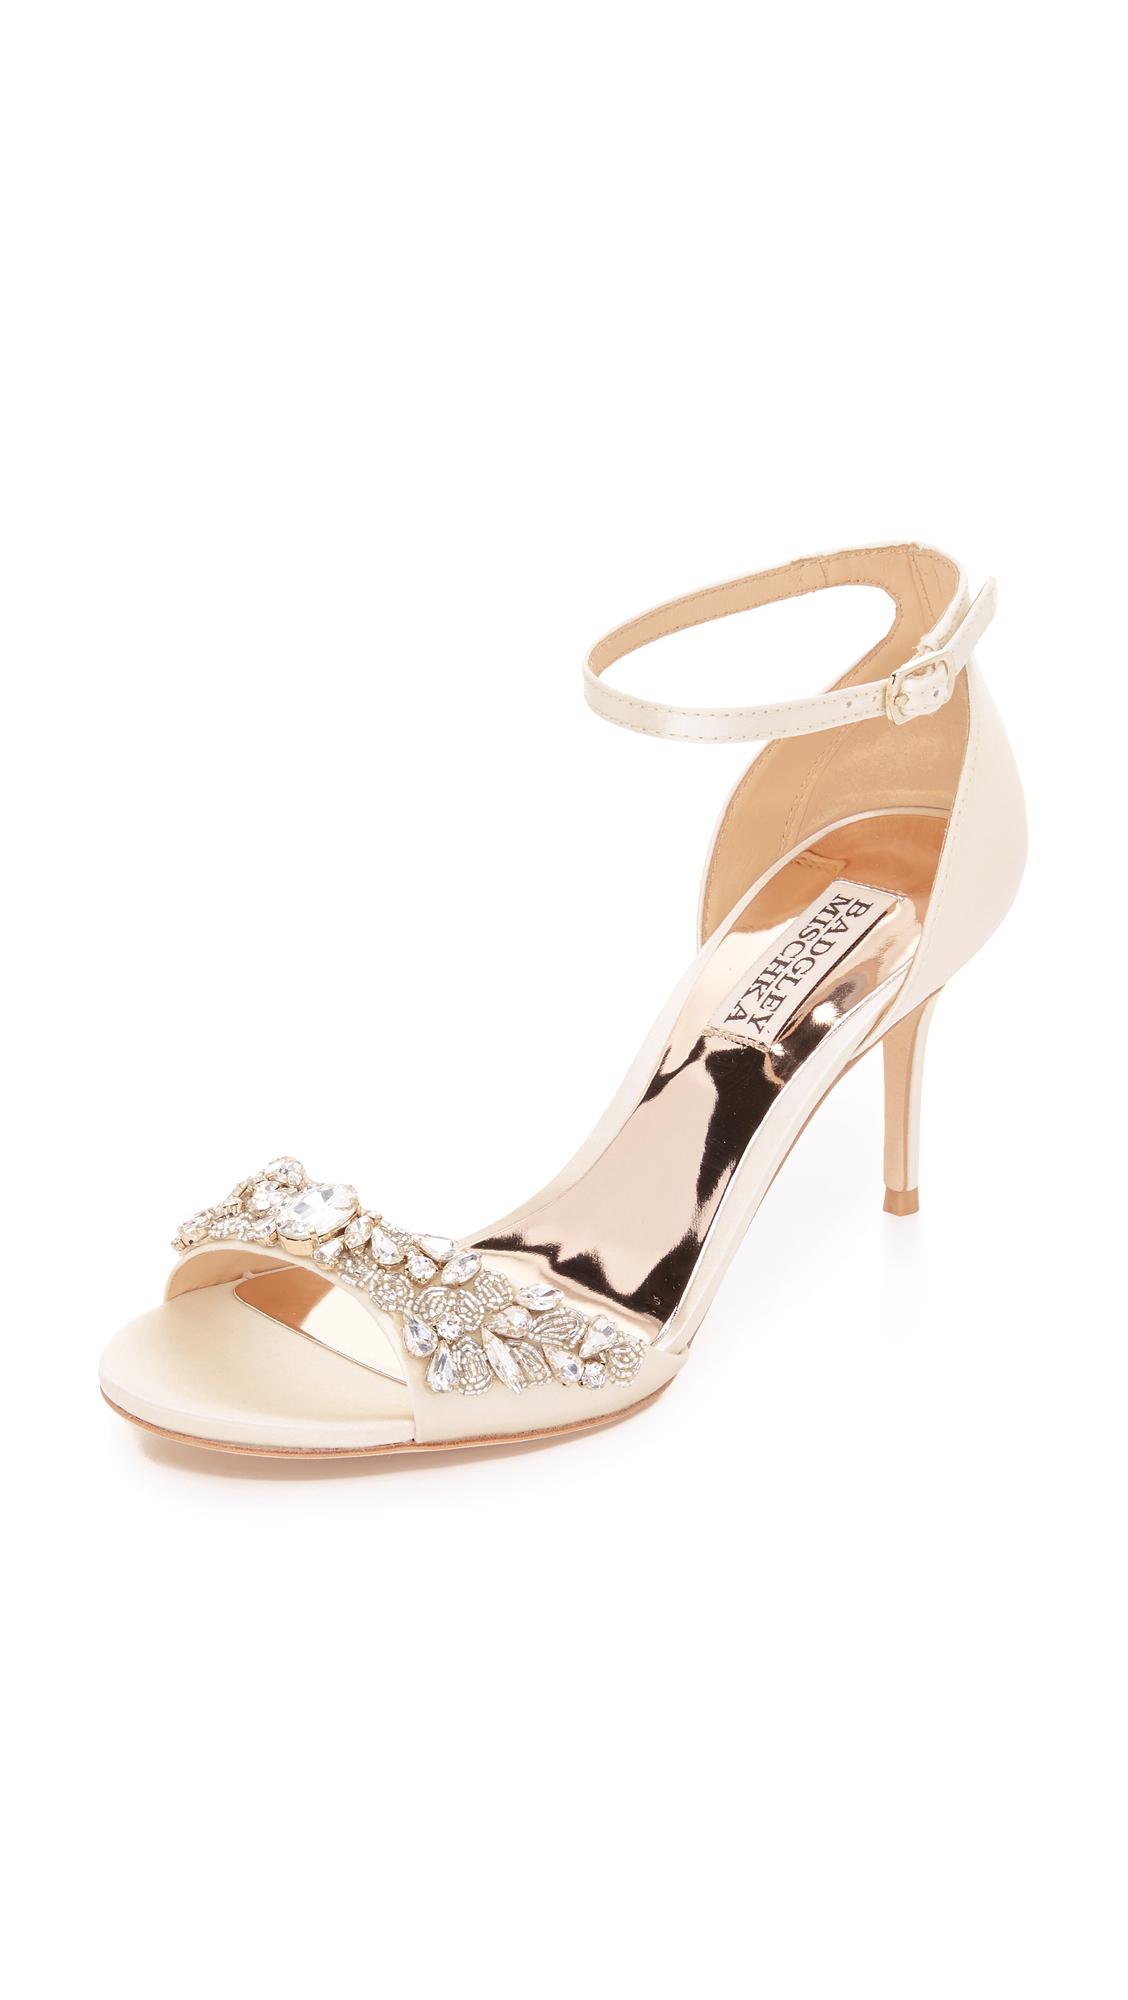 Photo of Badgley Mischka Bankston Sandals Ivory - Badgley Mischka online